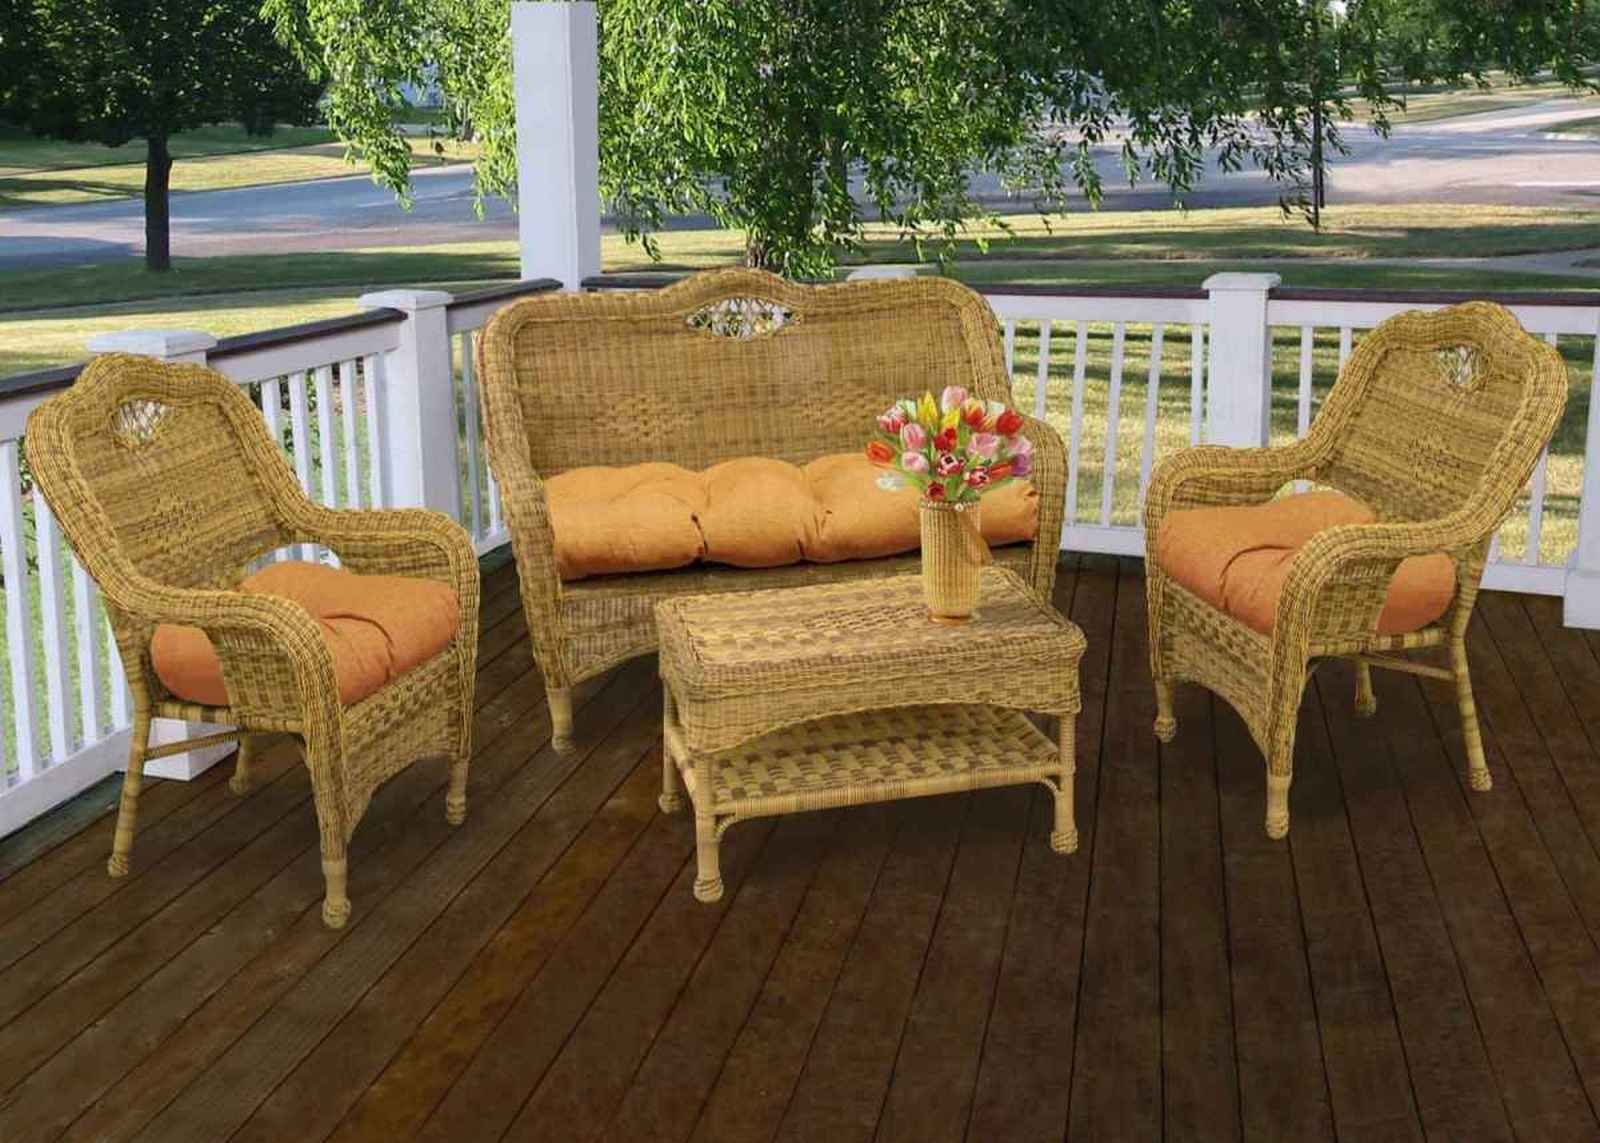 resin wicker outdoor furniture clearance Veranda möbel